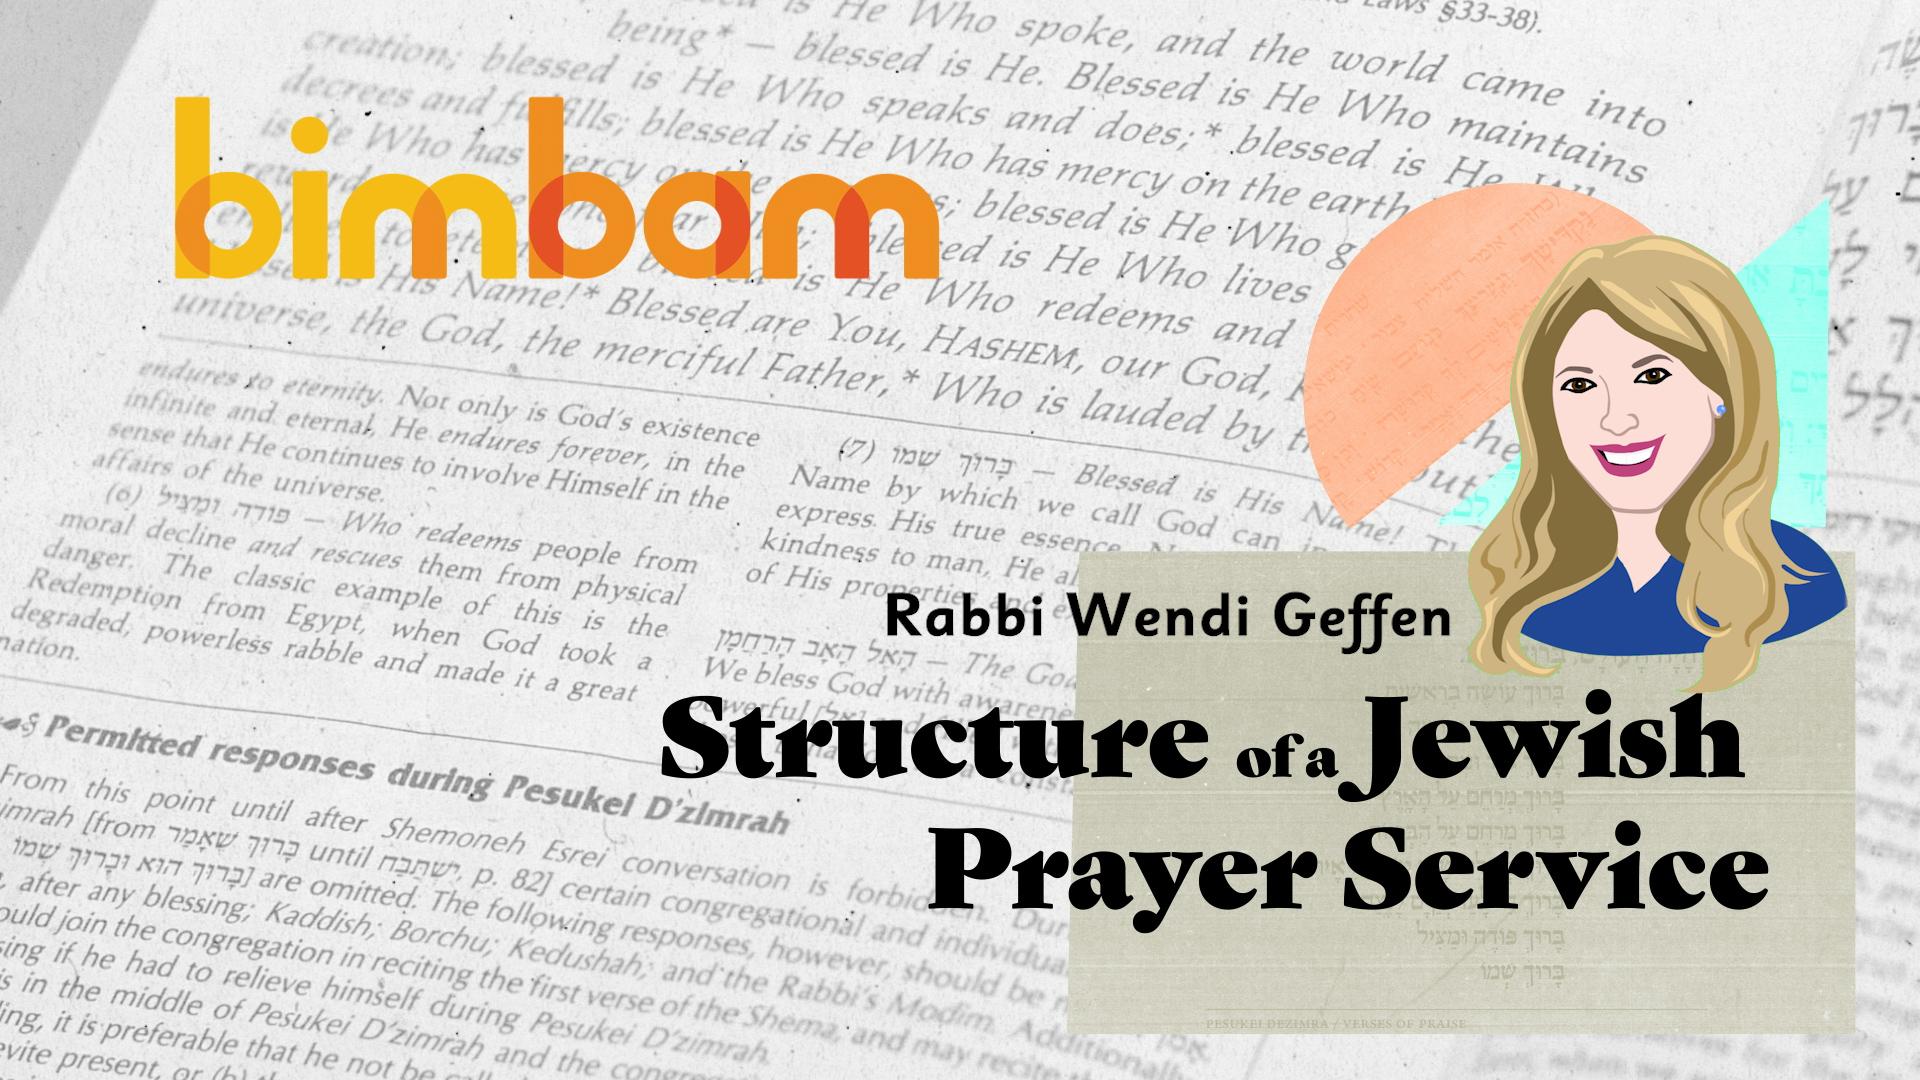 Jewish prayer service structure